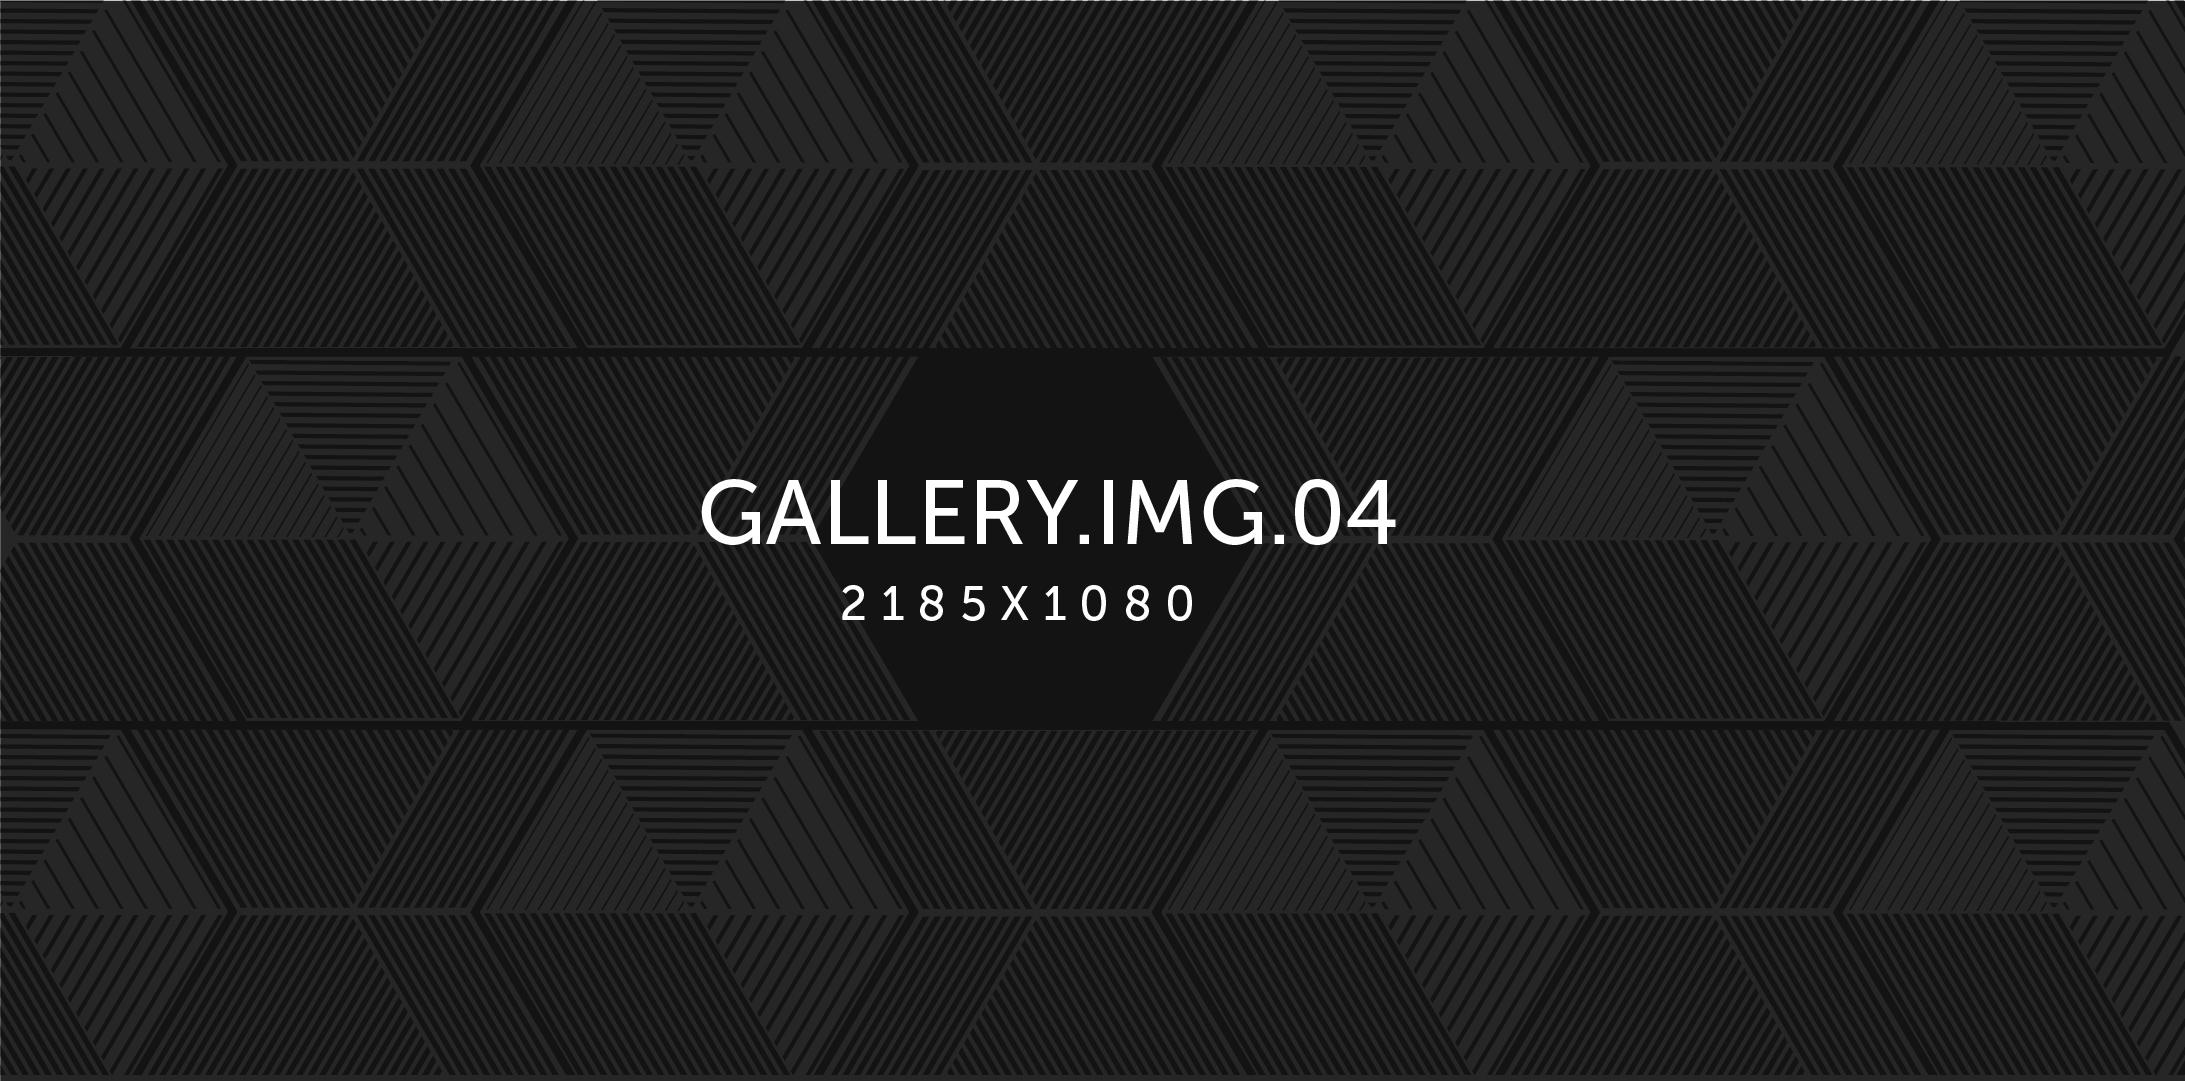 PB_GALLERY.iMG.04_2185x1080.jpg